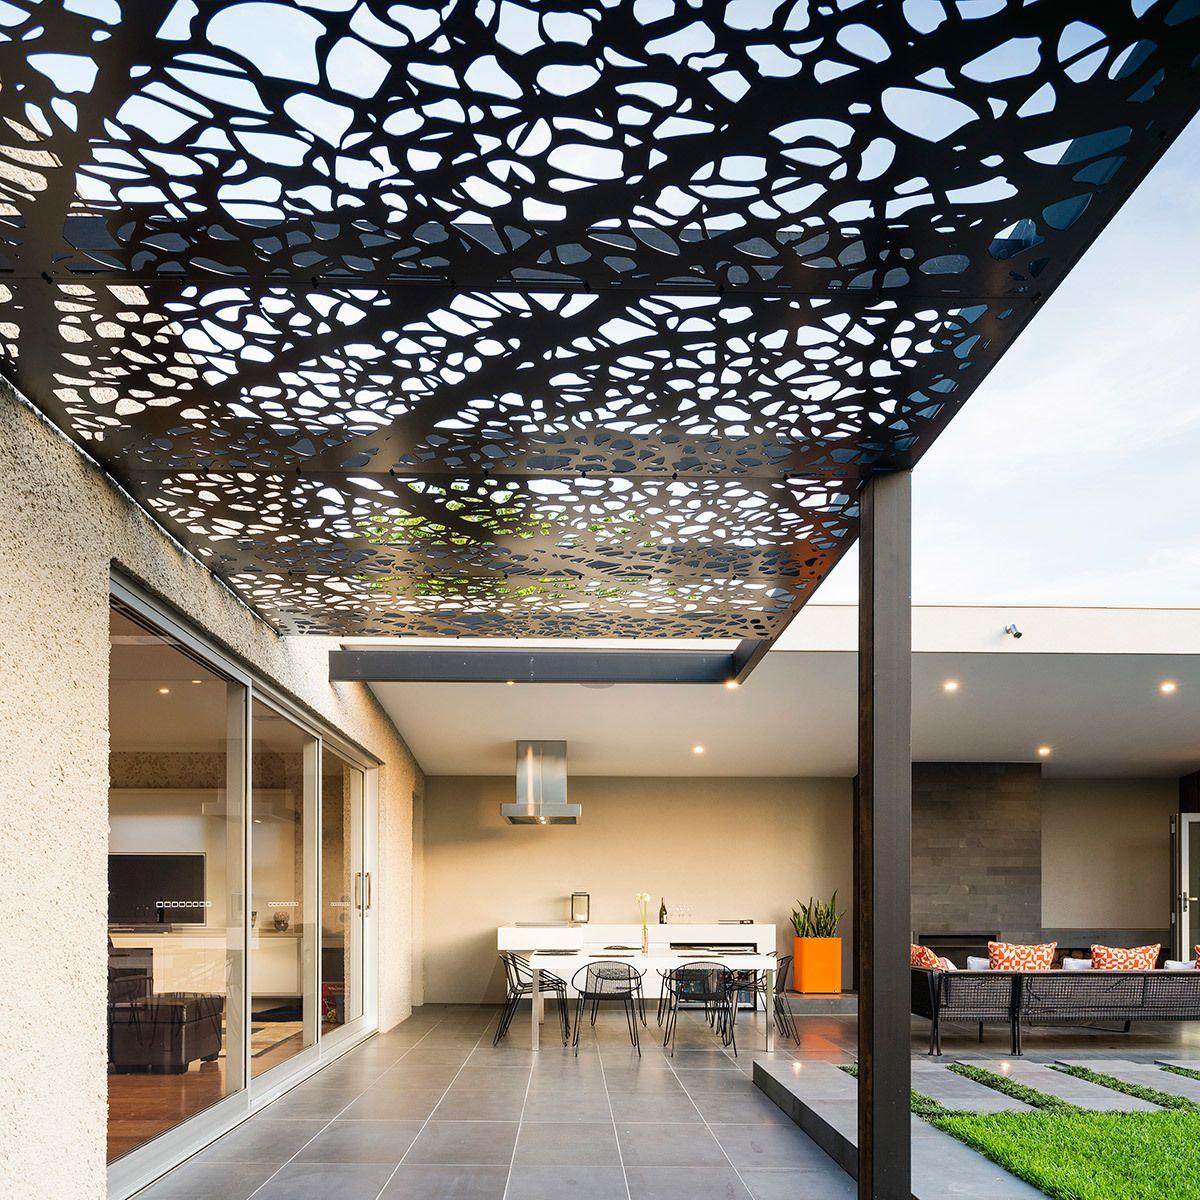 metall pergola 23 ideen f r alle jahreszeiten garten terrasse ideen garden pinterest. Black Bedroom Furniture Sets. Home Design Ideas